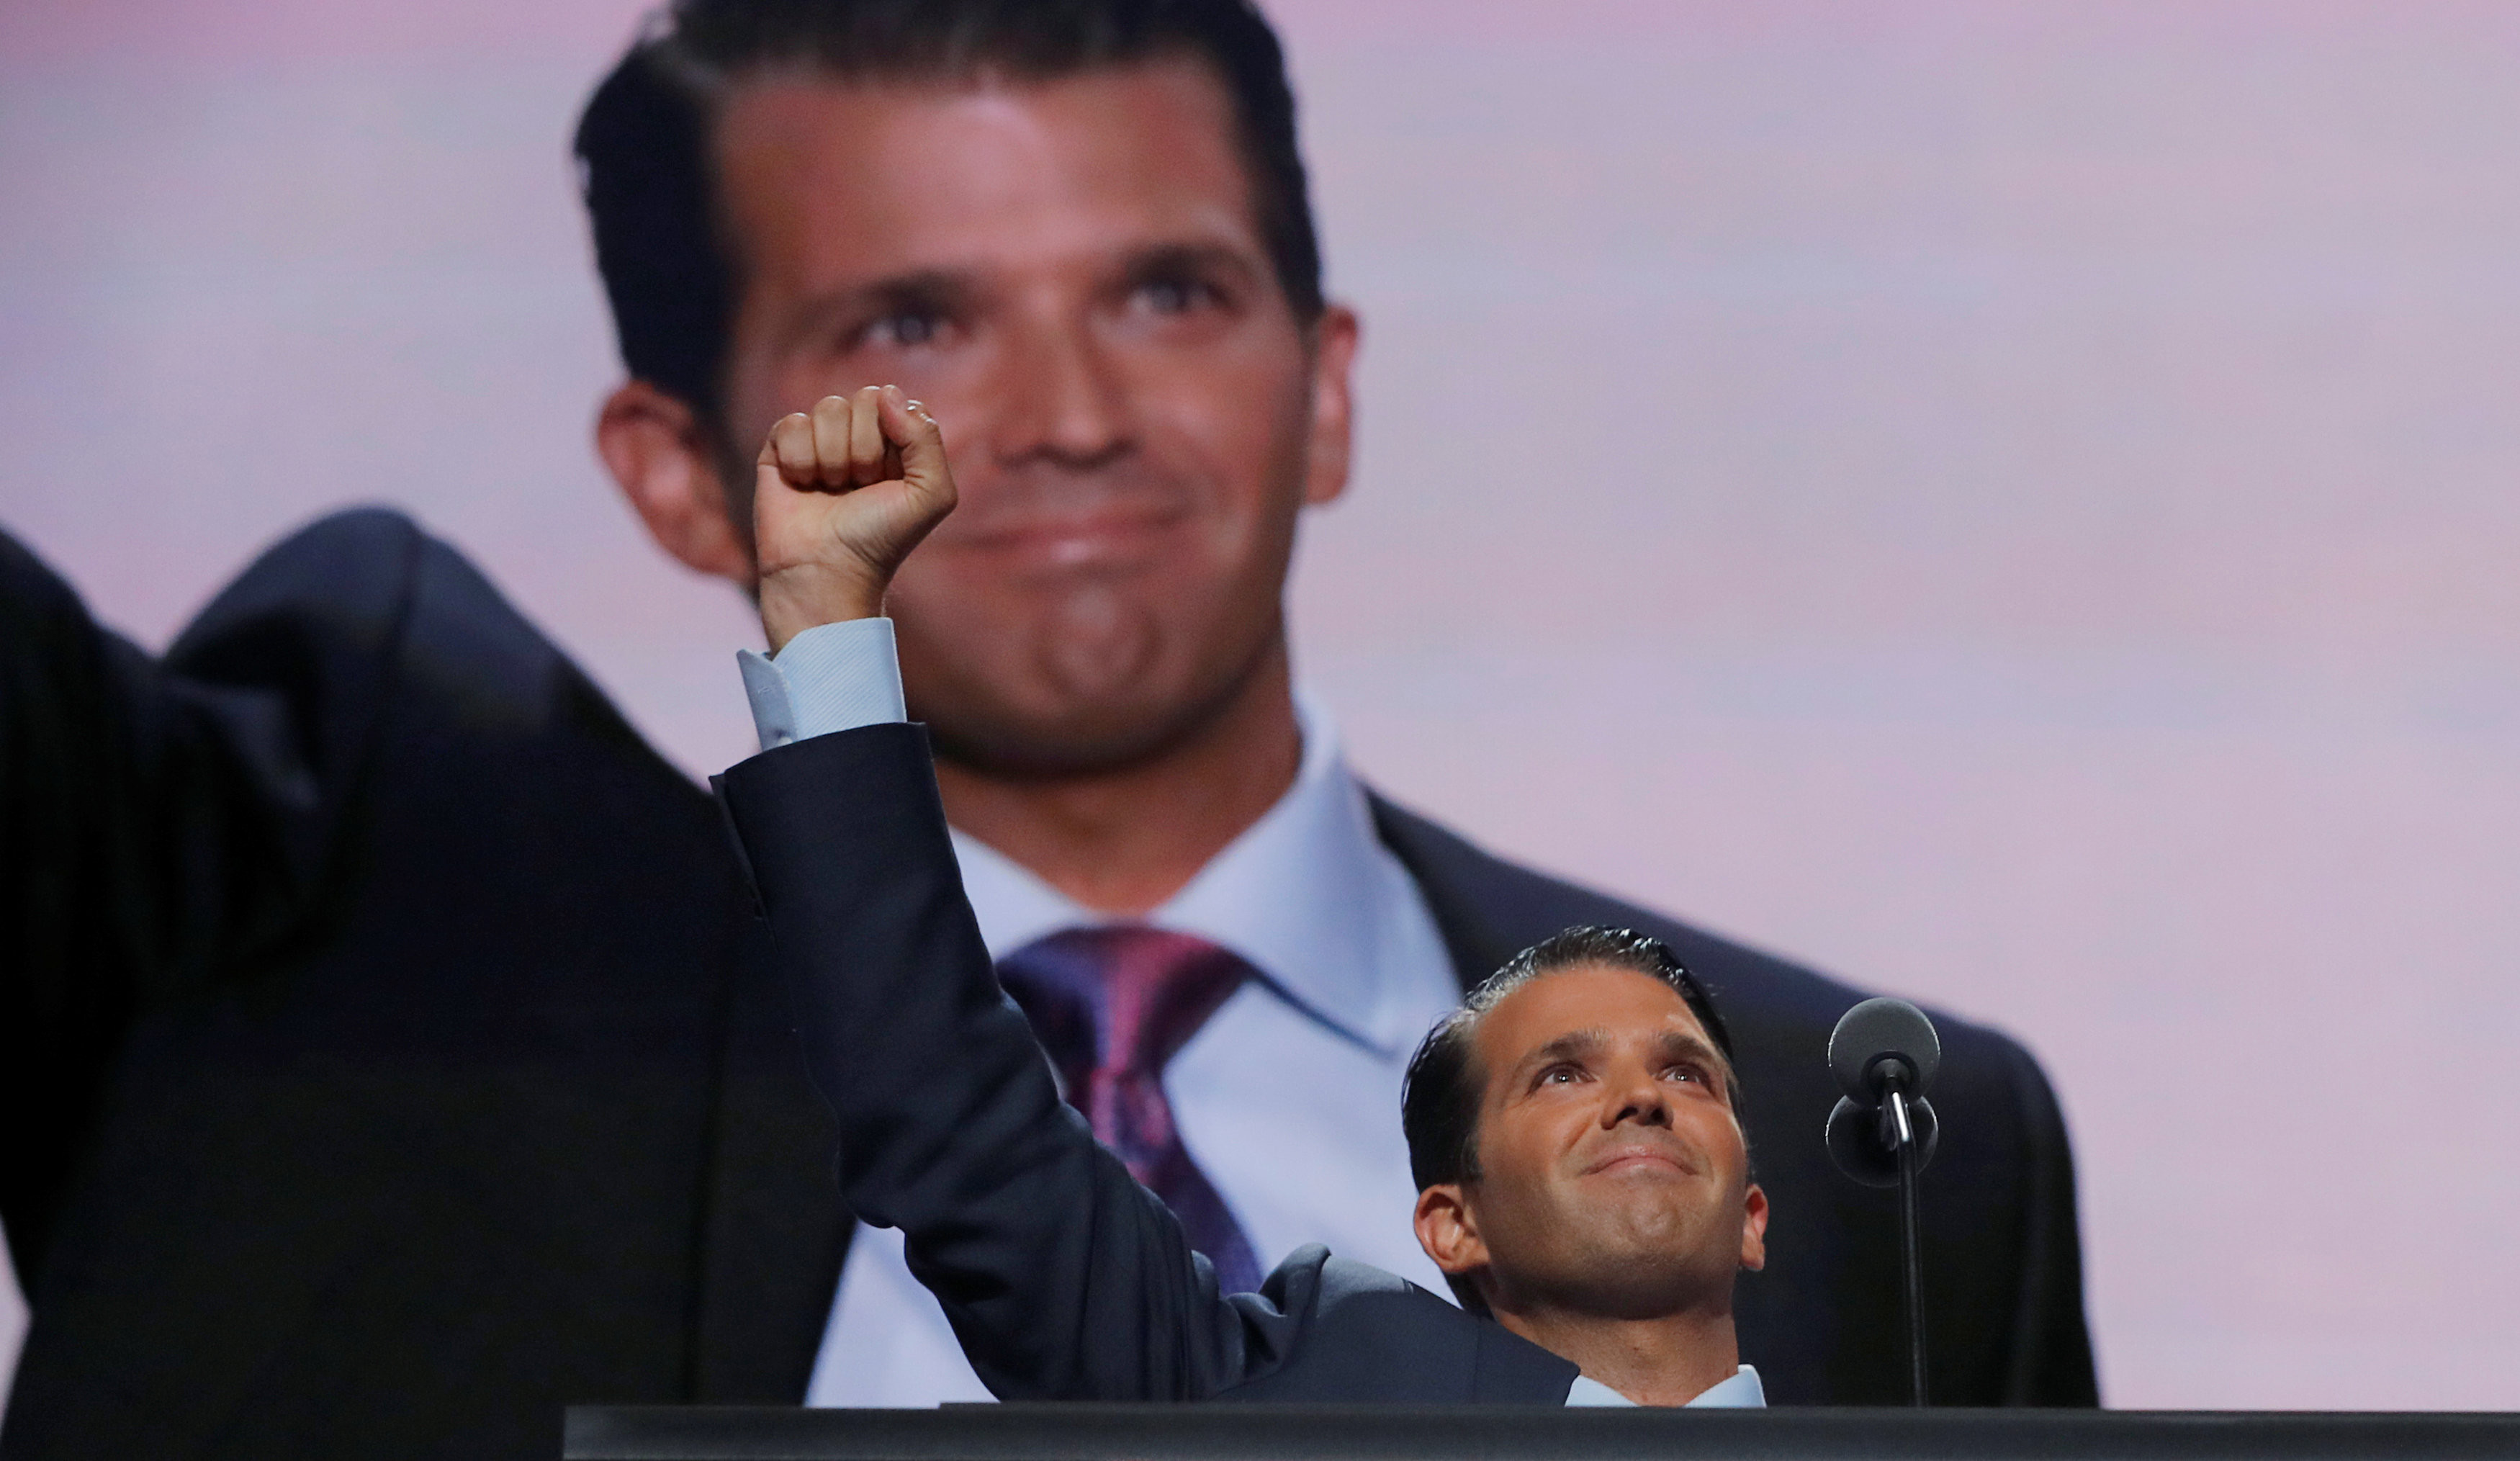 <p>Дональд Трамп-младший. Фото: <span>&copy;&nbsp;</span><span>REUTERS/Brian Snyder</span></p>